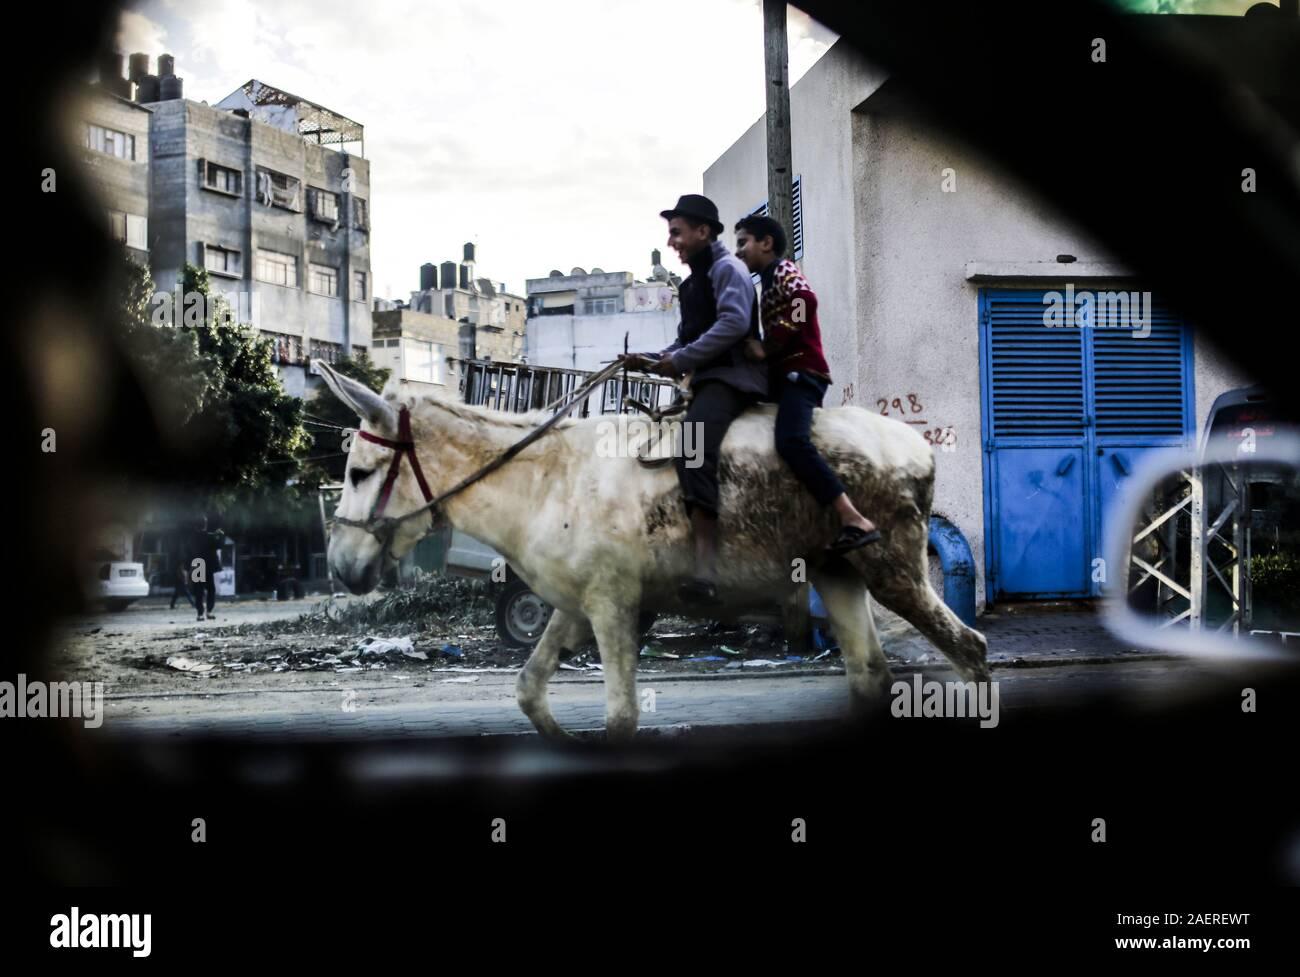 Gaza City, The Gaza Strip, Palestine. 10th Dec, 2019. Palestinian children ride on a donkey in Gaza City on December 10, 2019 Credit: Mahmoud Issa/Quds Net News/ZUMA Wire/Alamy Live News Stock Photo